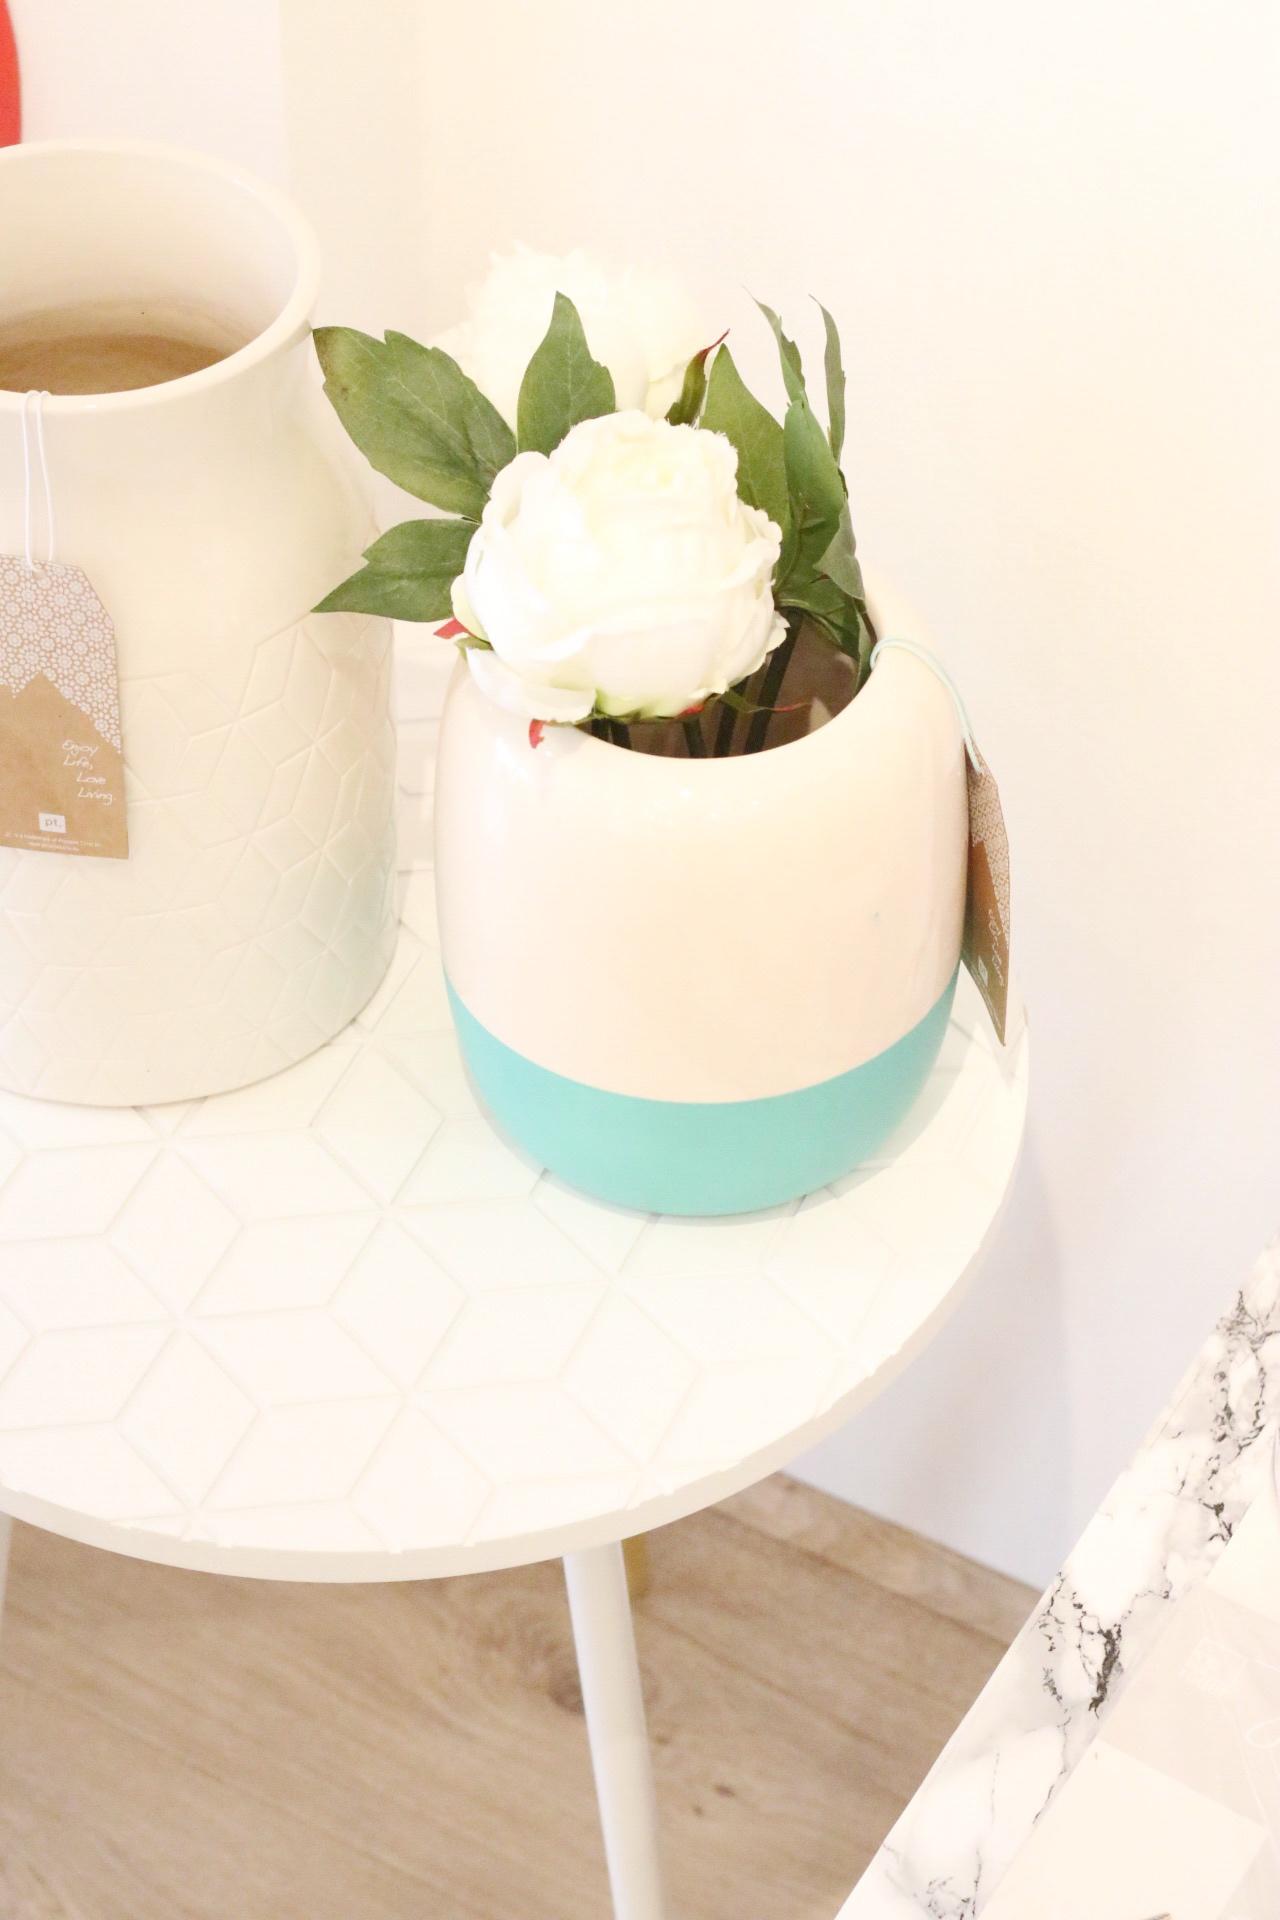 des petits tr sors chez cocoon dis oui ninon. Black Bedroom Furniture Sets. Home Design Ideas